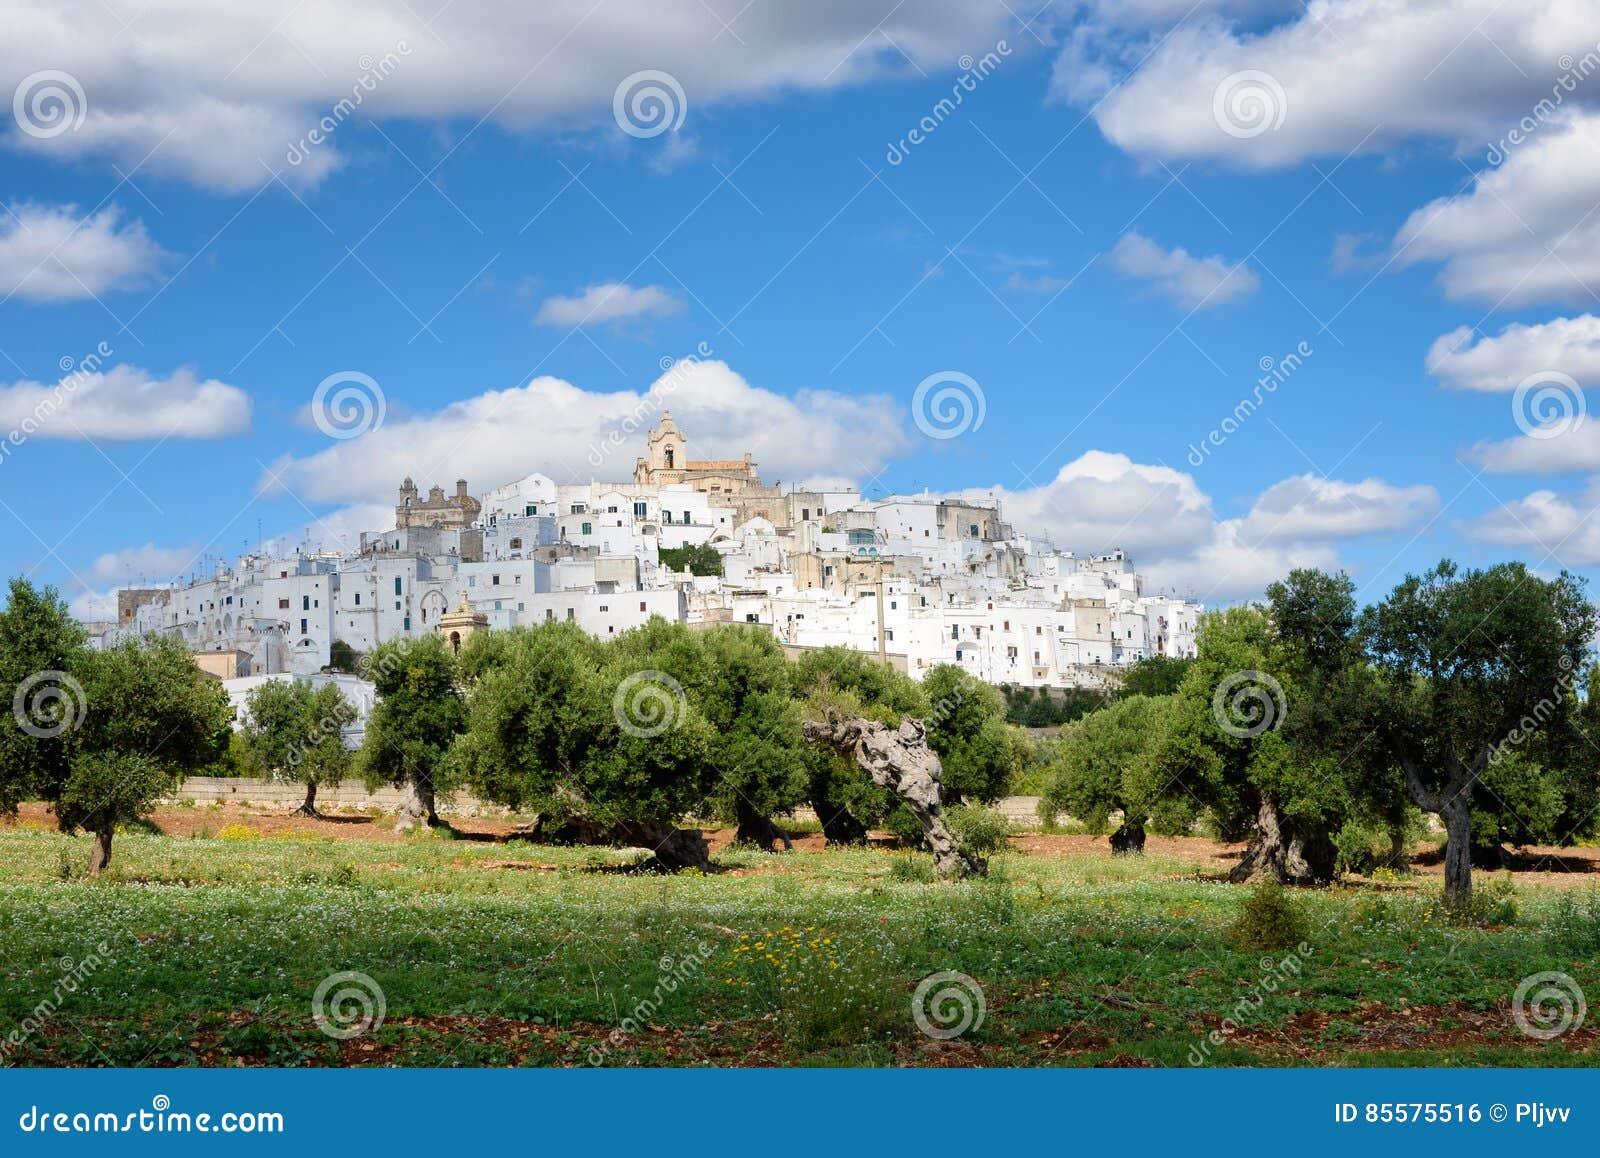 Puglia white city Ostuni with olive trees